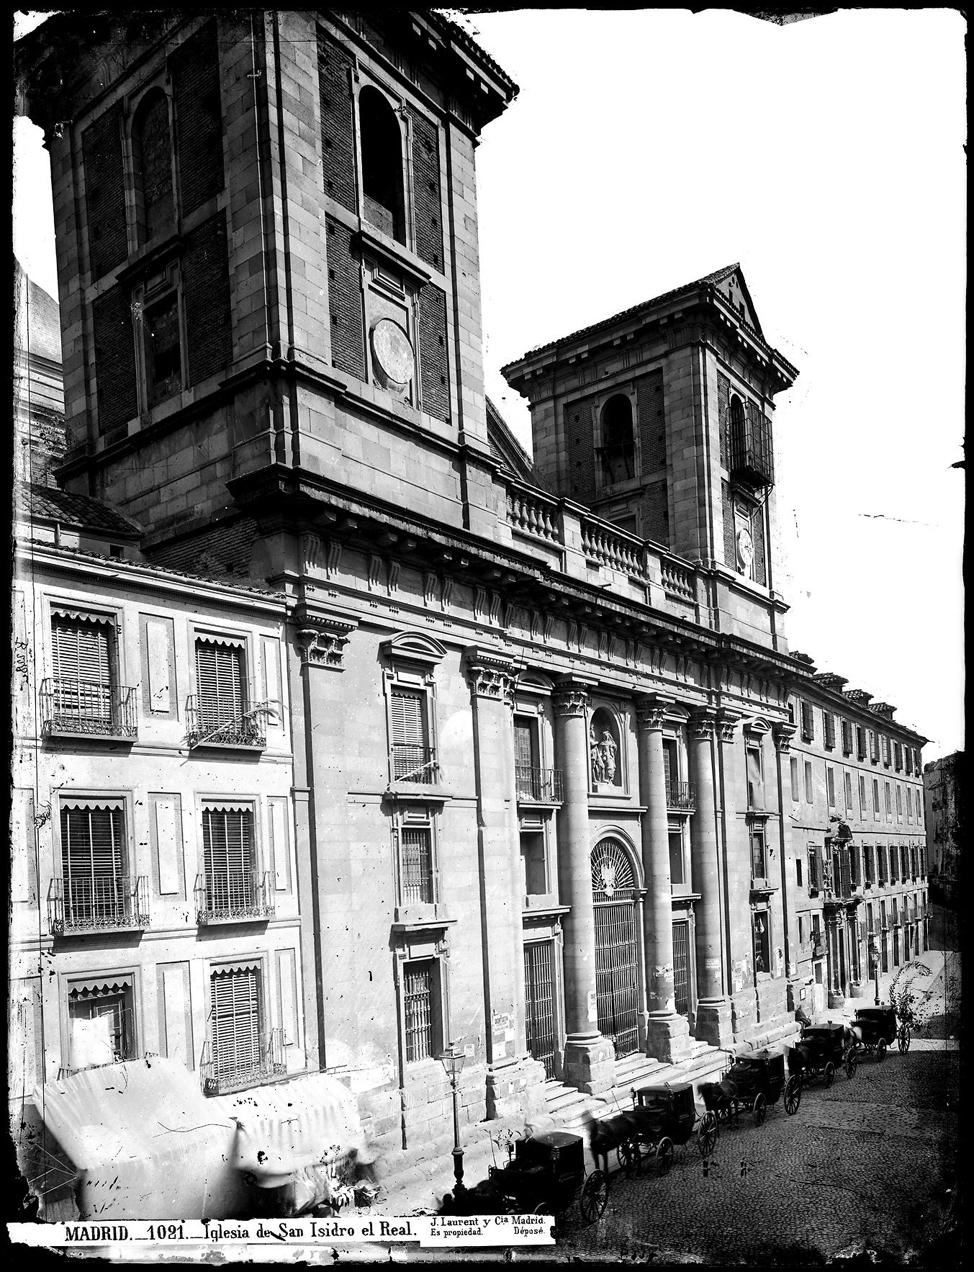 Madrid en 1854 seg n alfred guesdon for Biblioteca iglesia madrid